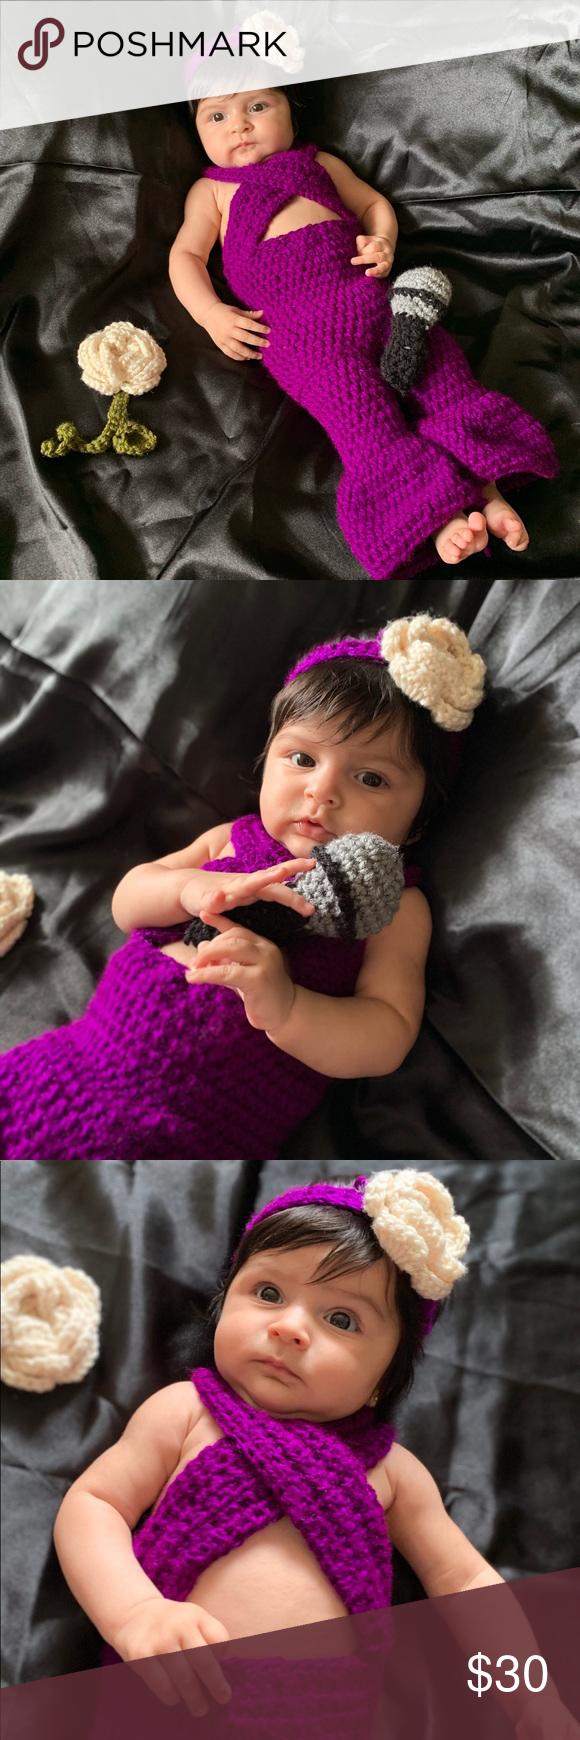 Selena Quintanilla Crochet Costume Discounted crochet